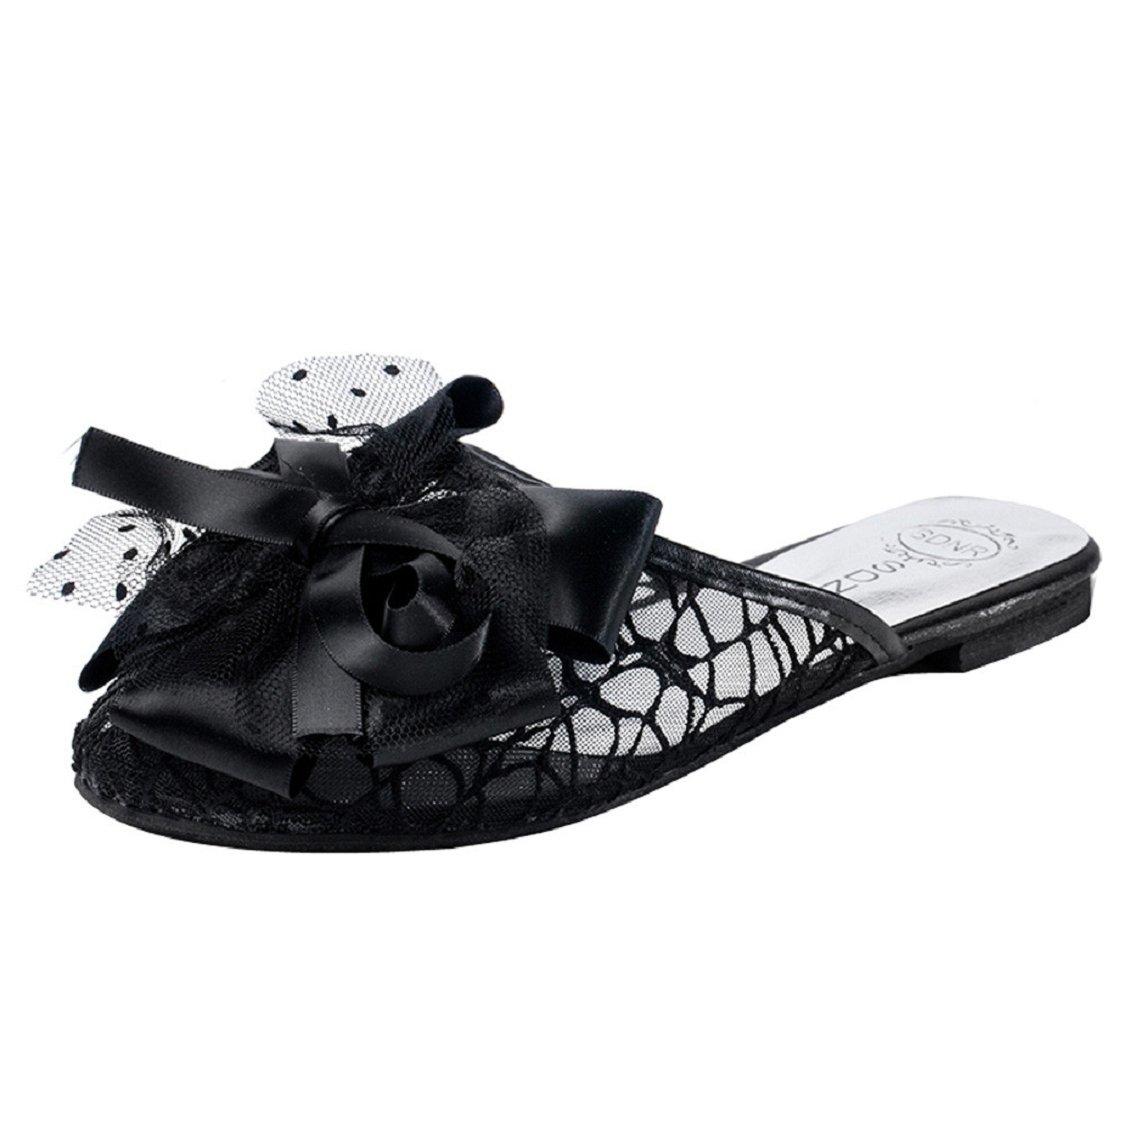 737f33bd6c7 Amazon.com  Sunfei Women Summer Beach Slippers Flat Heels Flip Flops  Bohemia Lace Bow Sandals  Clothing